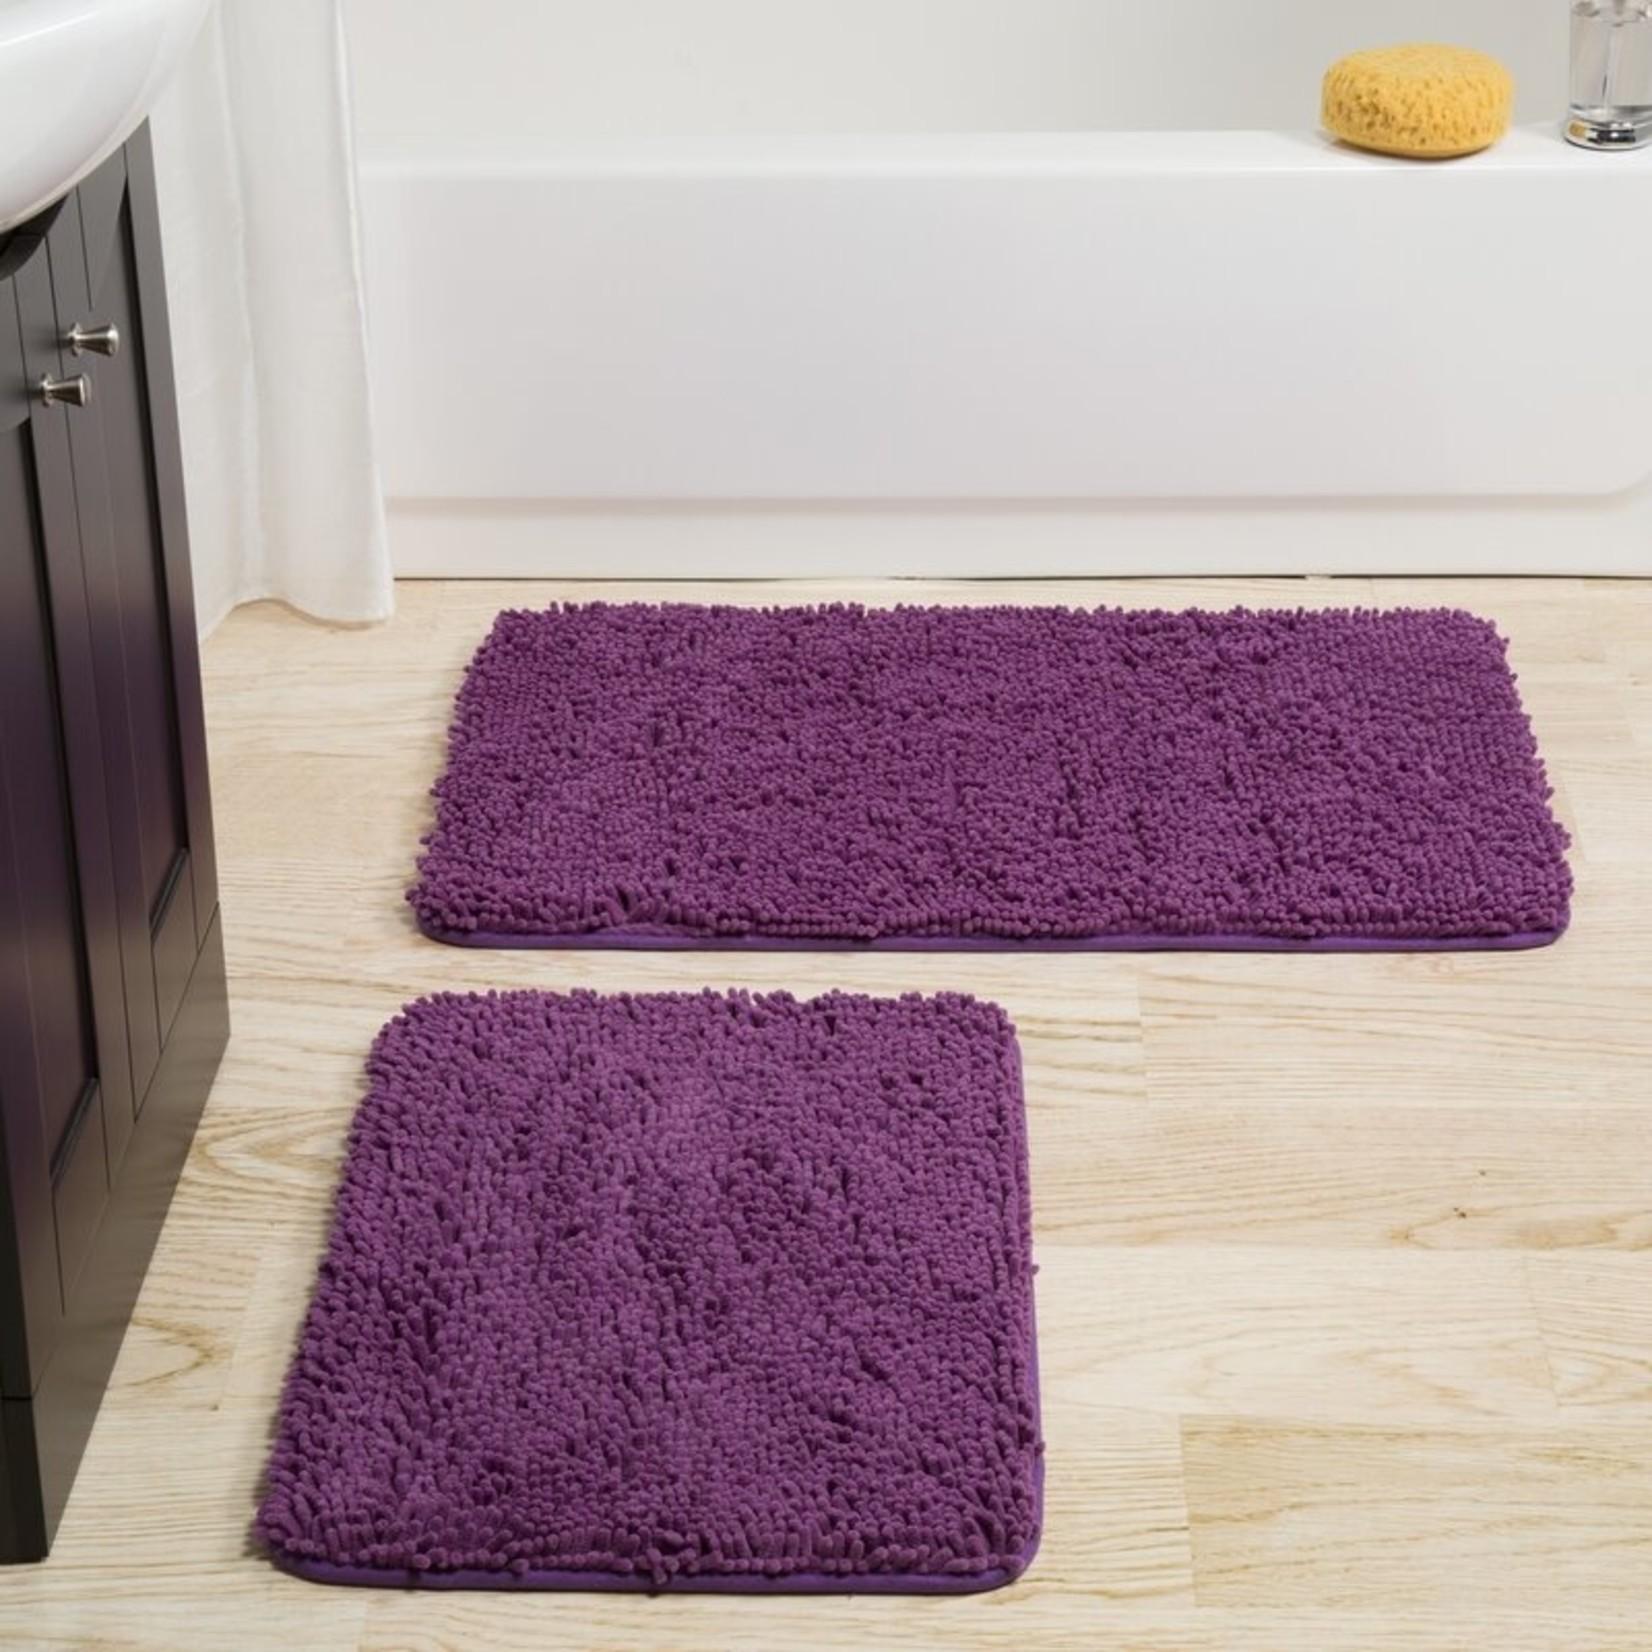 *Memory Foam Shag 2 Piece Bath Rug Set - Purple